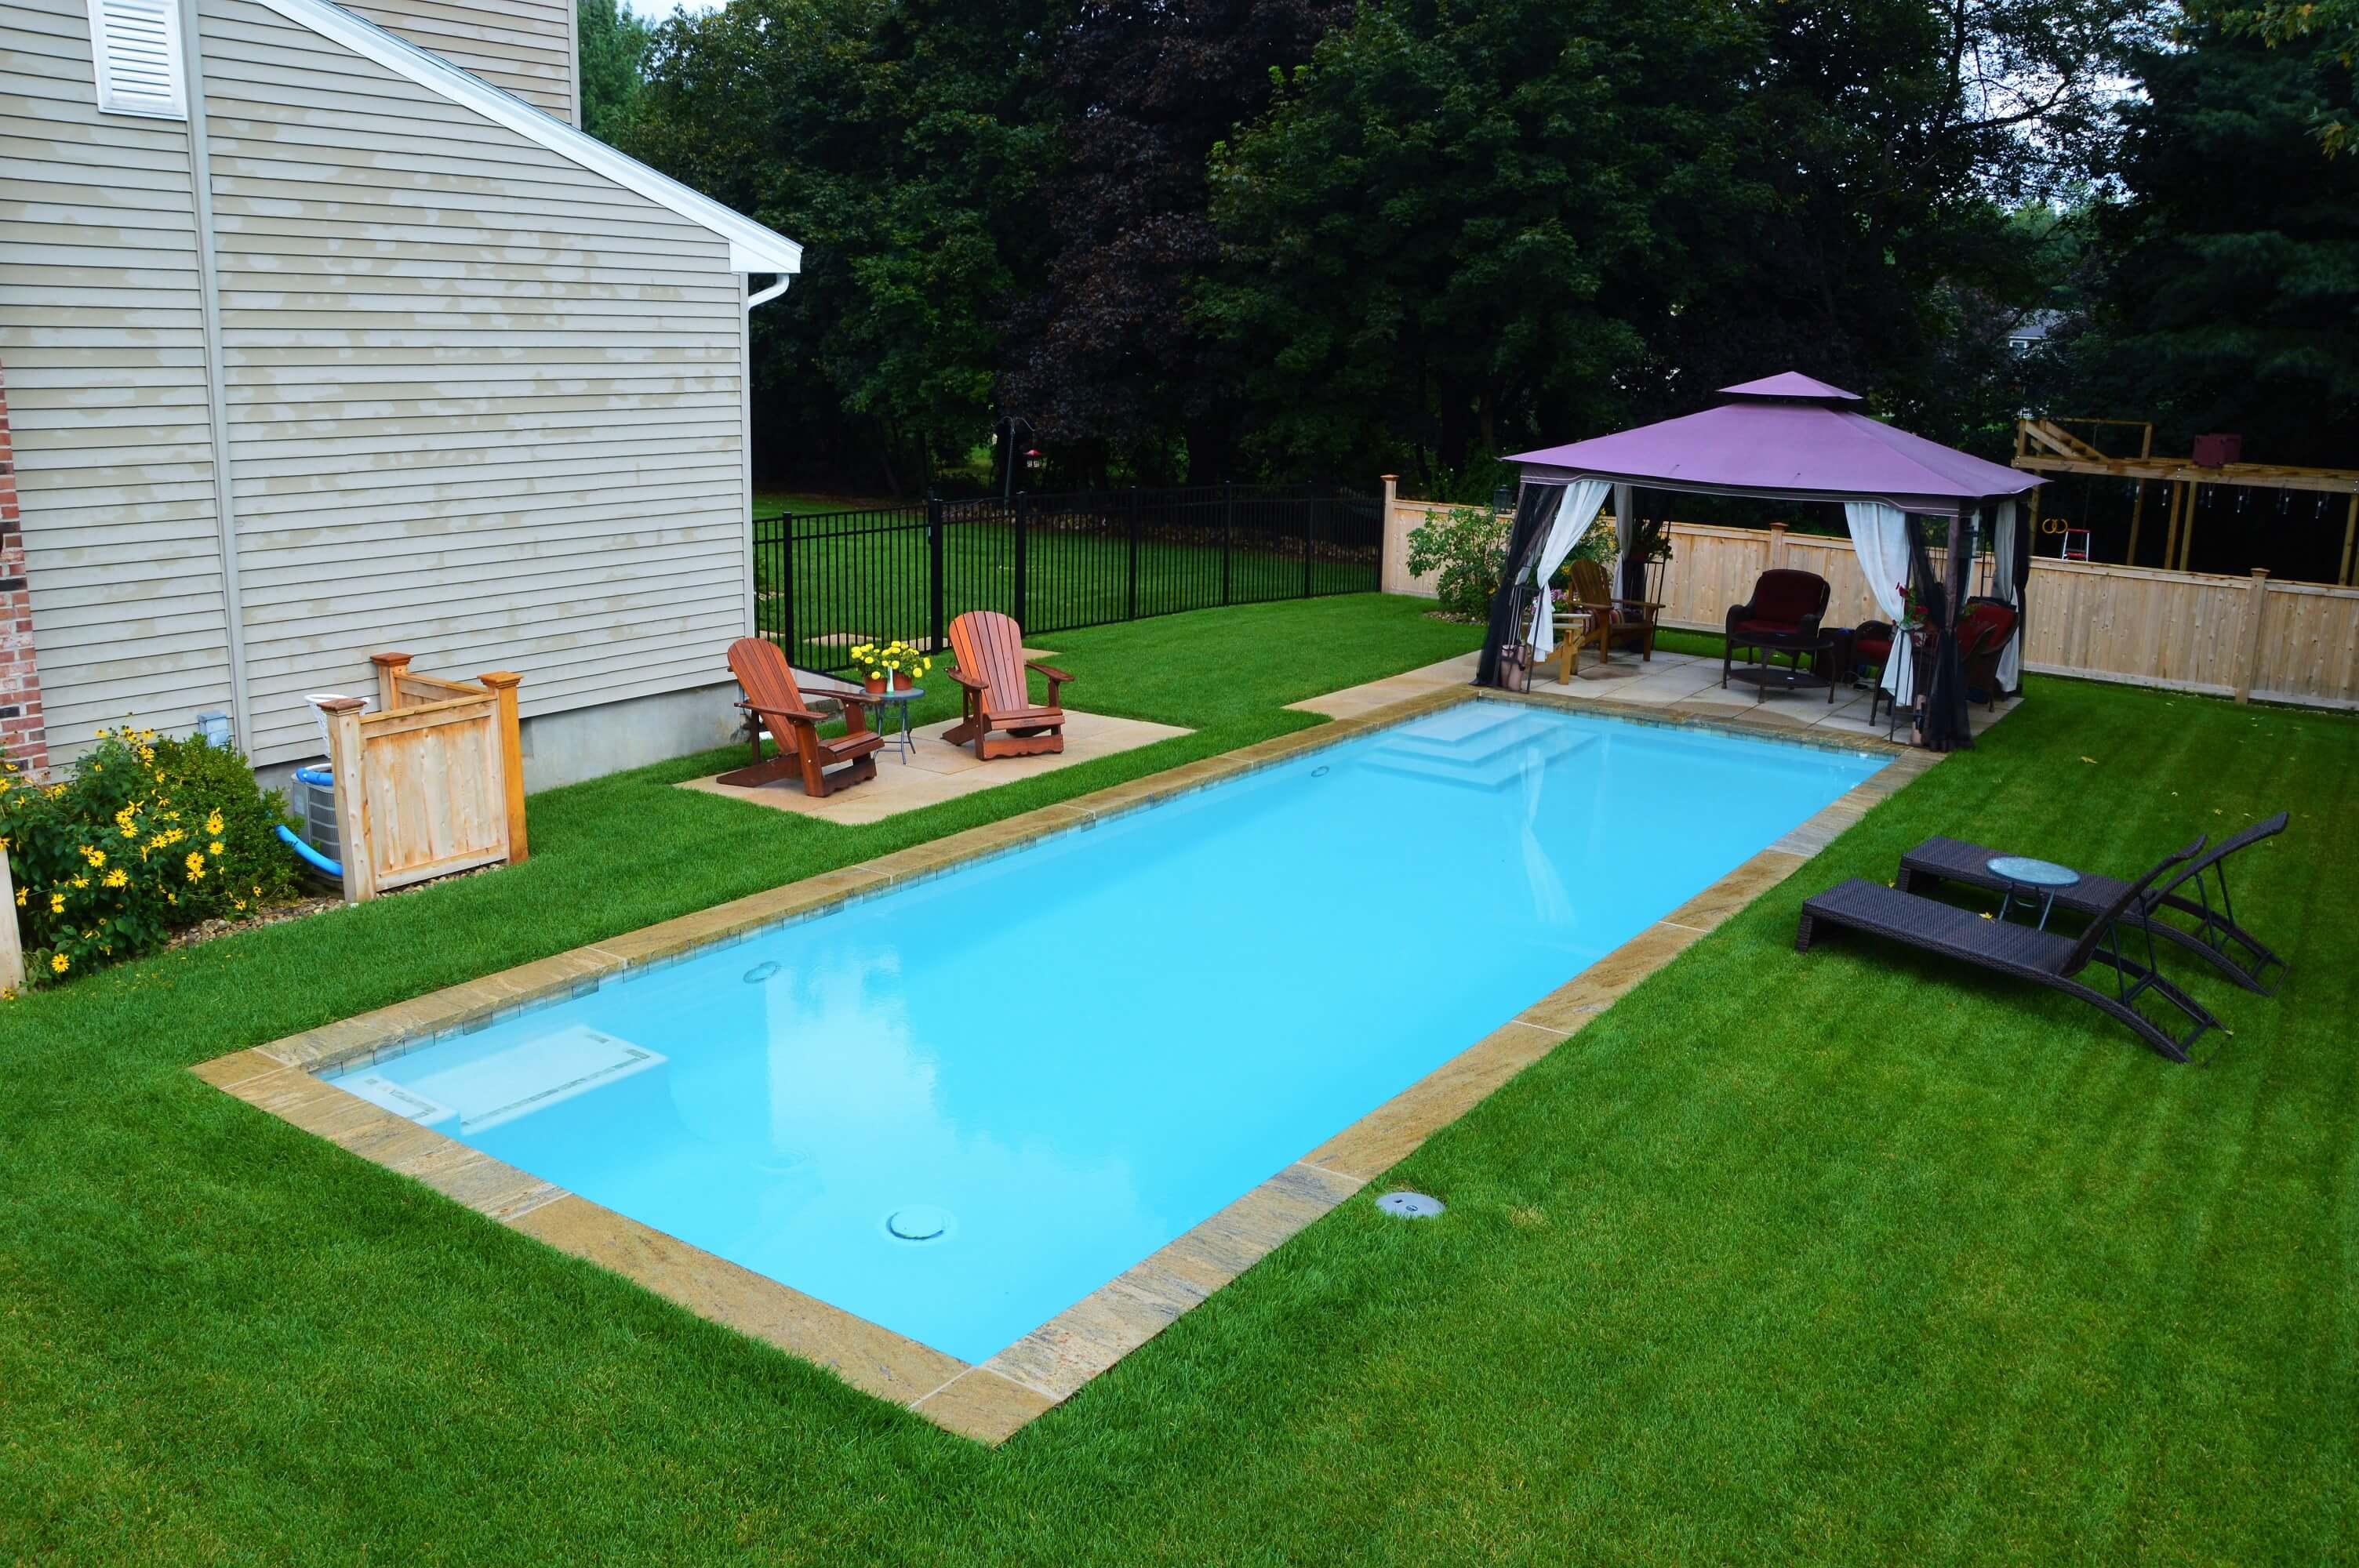 Top Trends in Inground Pool Design